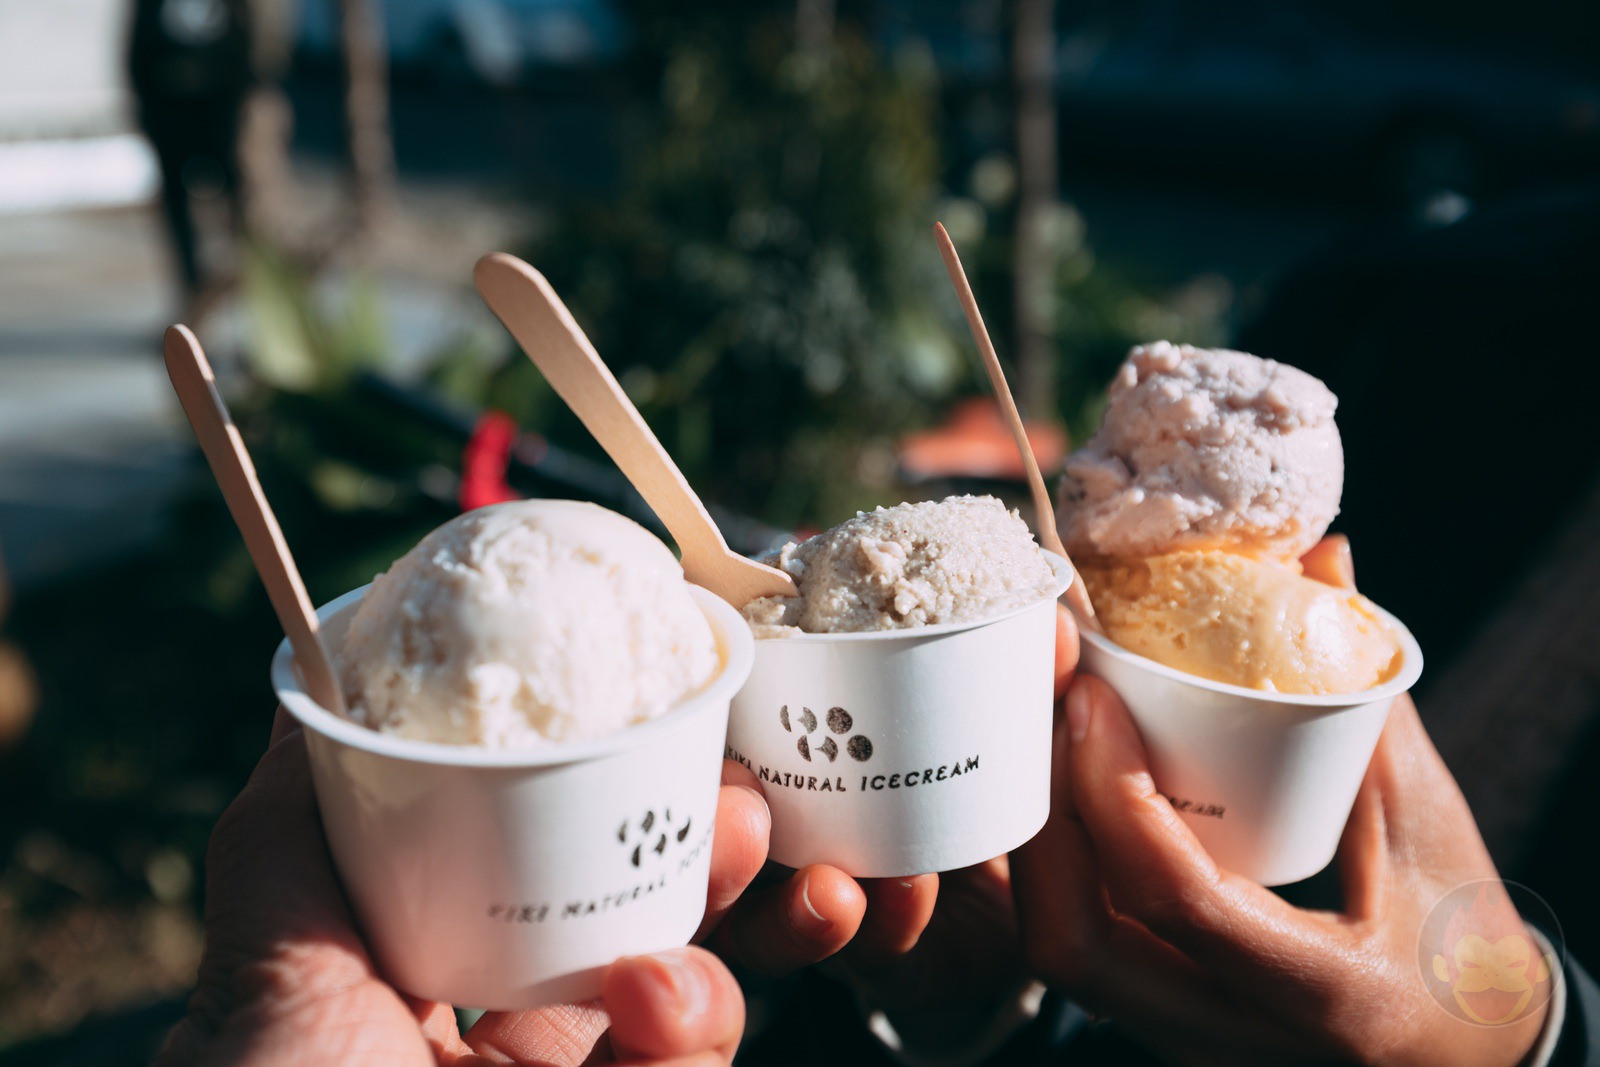 Mikotoya Ice Cream Crowd Funding 11